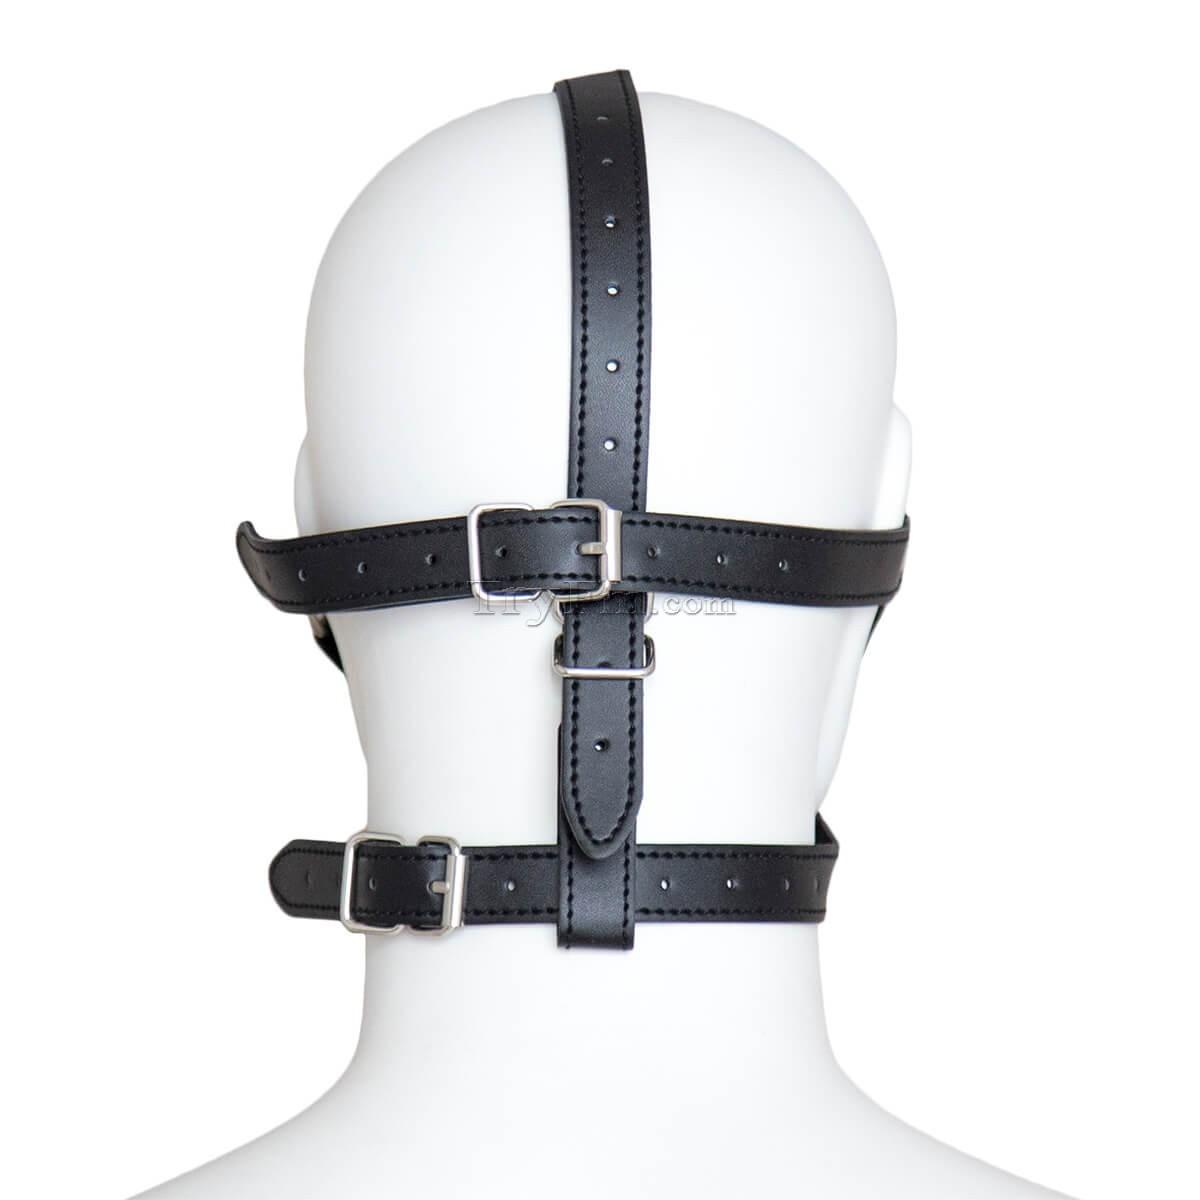 24-Blindfold-Harness-and-Ball-Gag-4.jpg